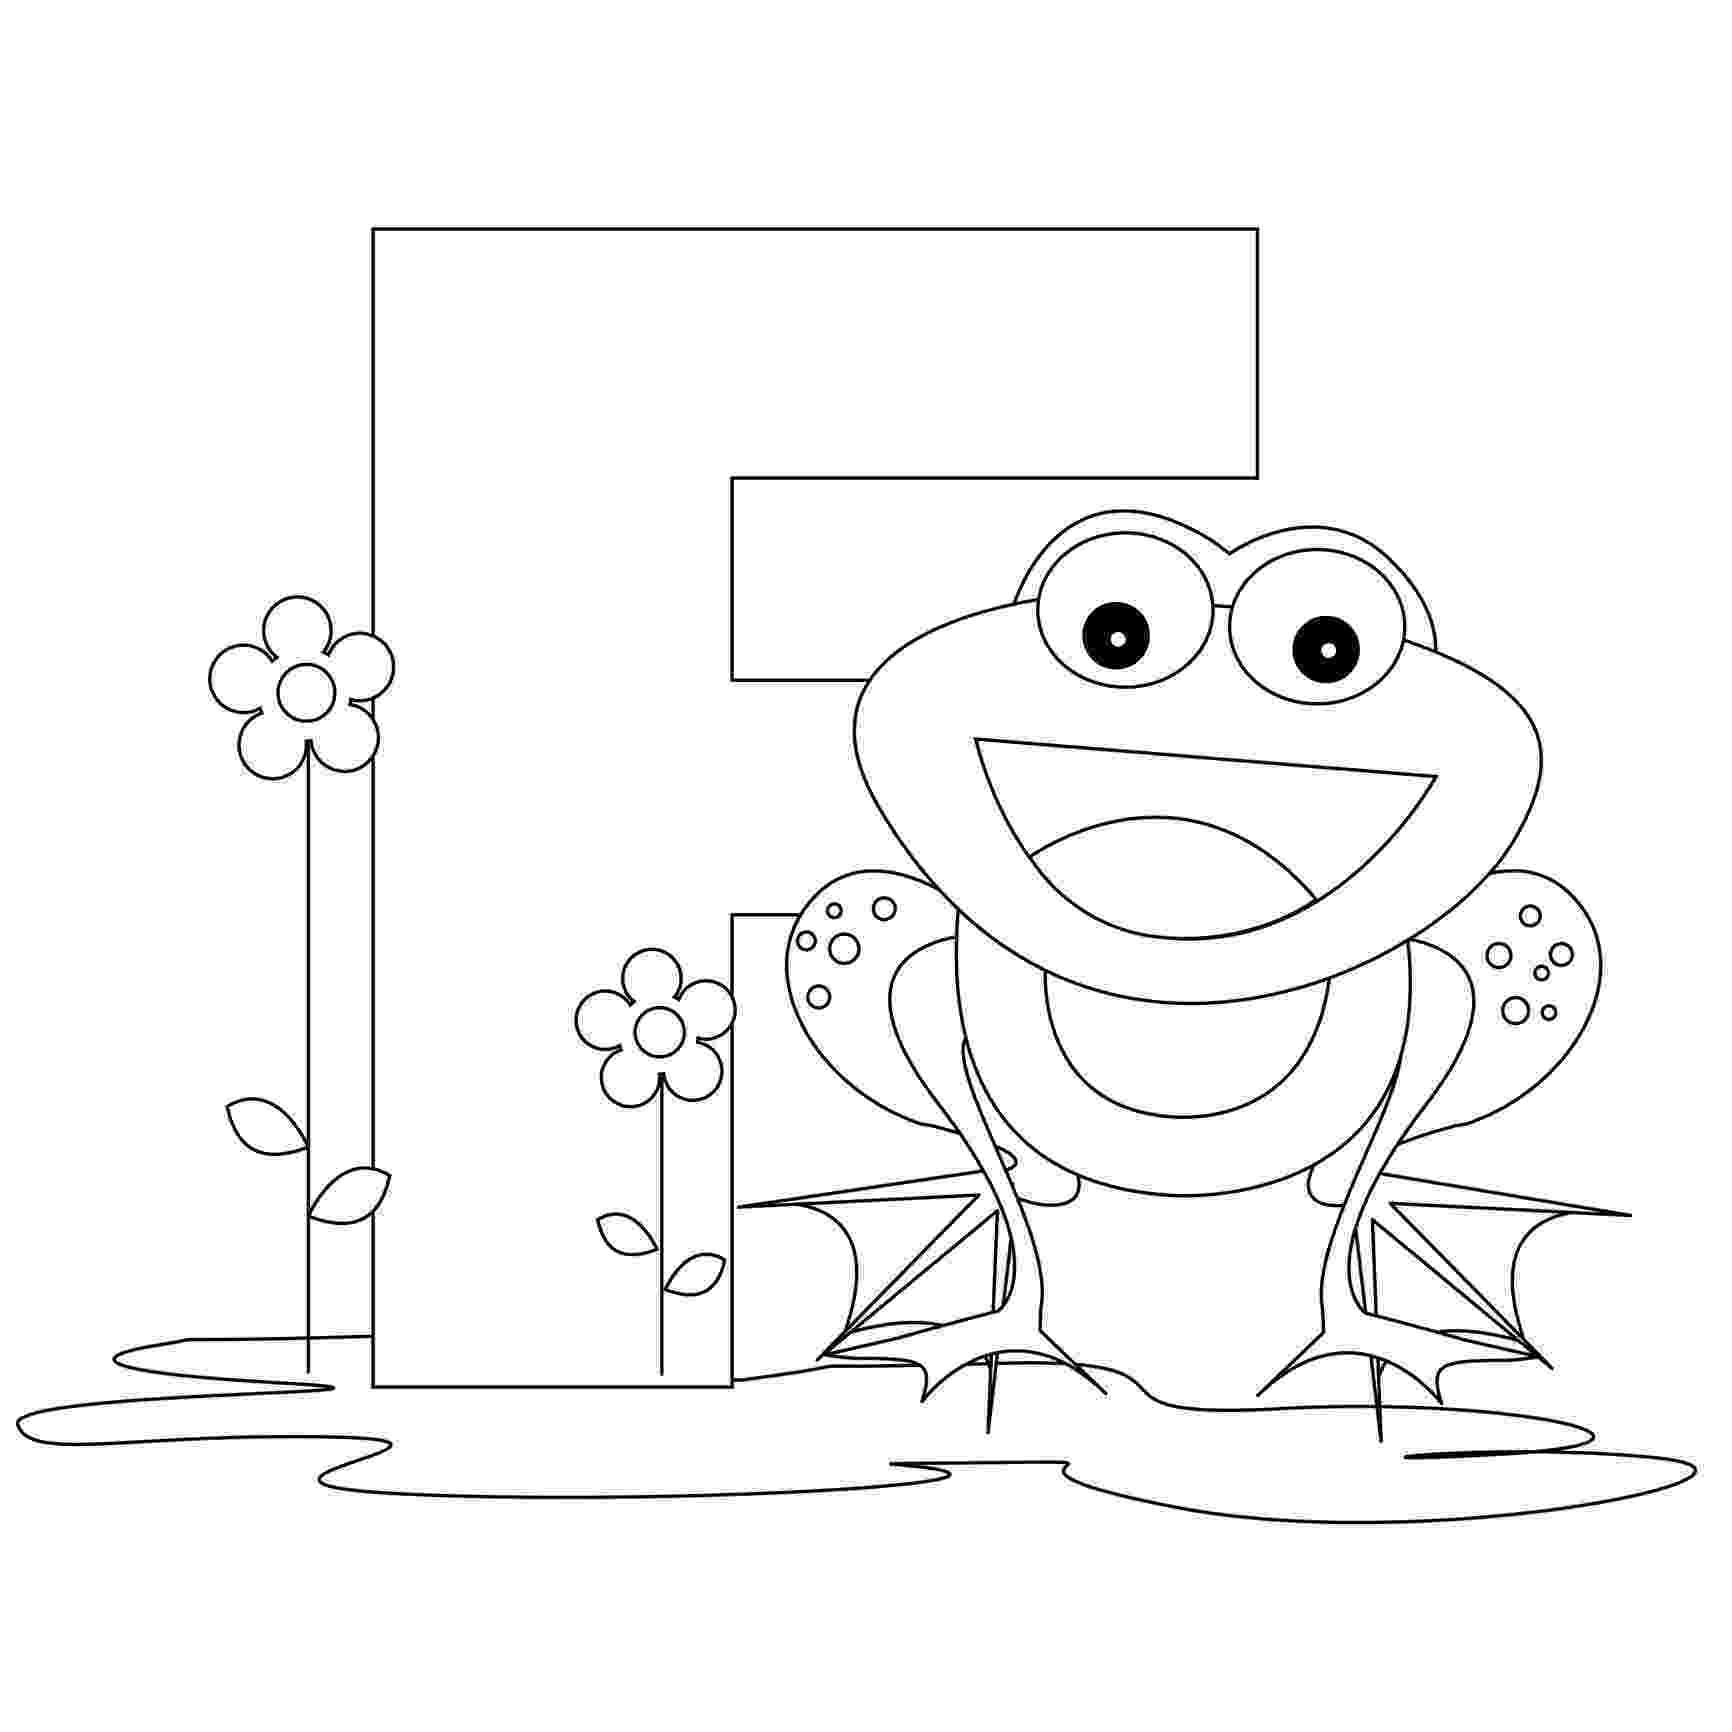 coloring book alphabet free printable alphabet coloring pages for kids best coloring alphabet book 1 1